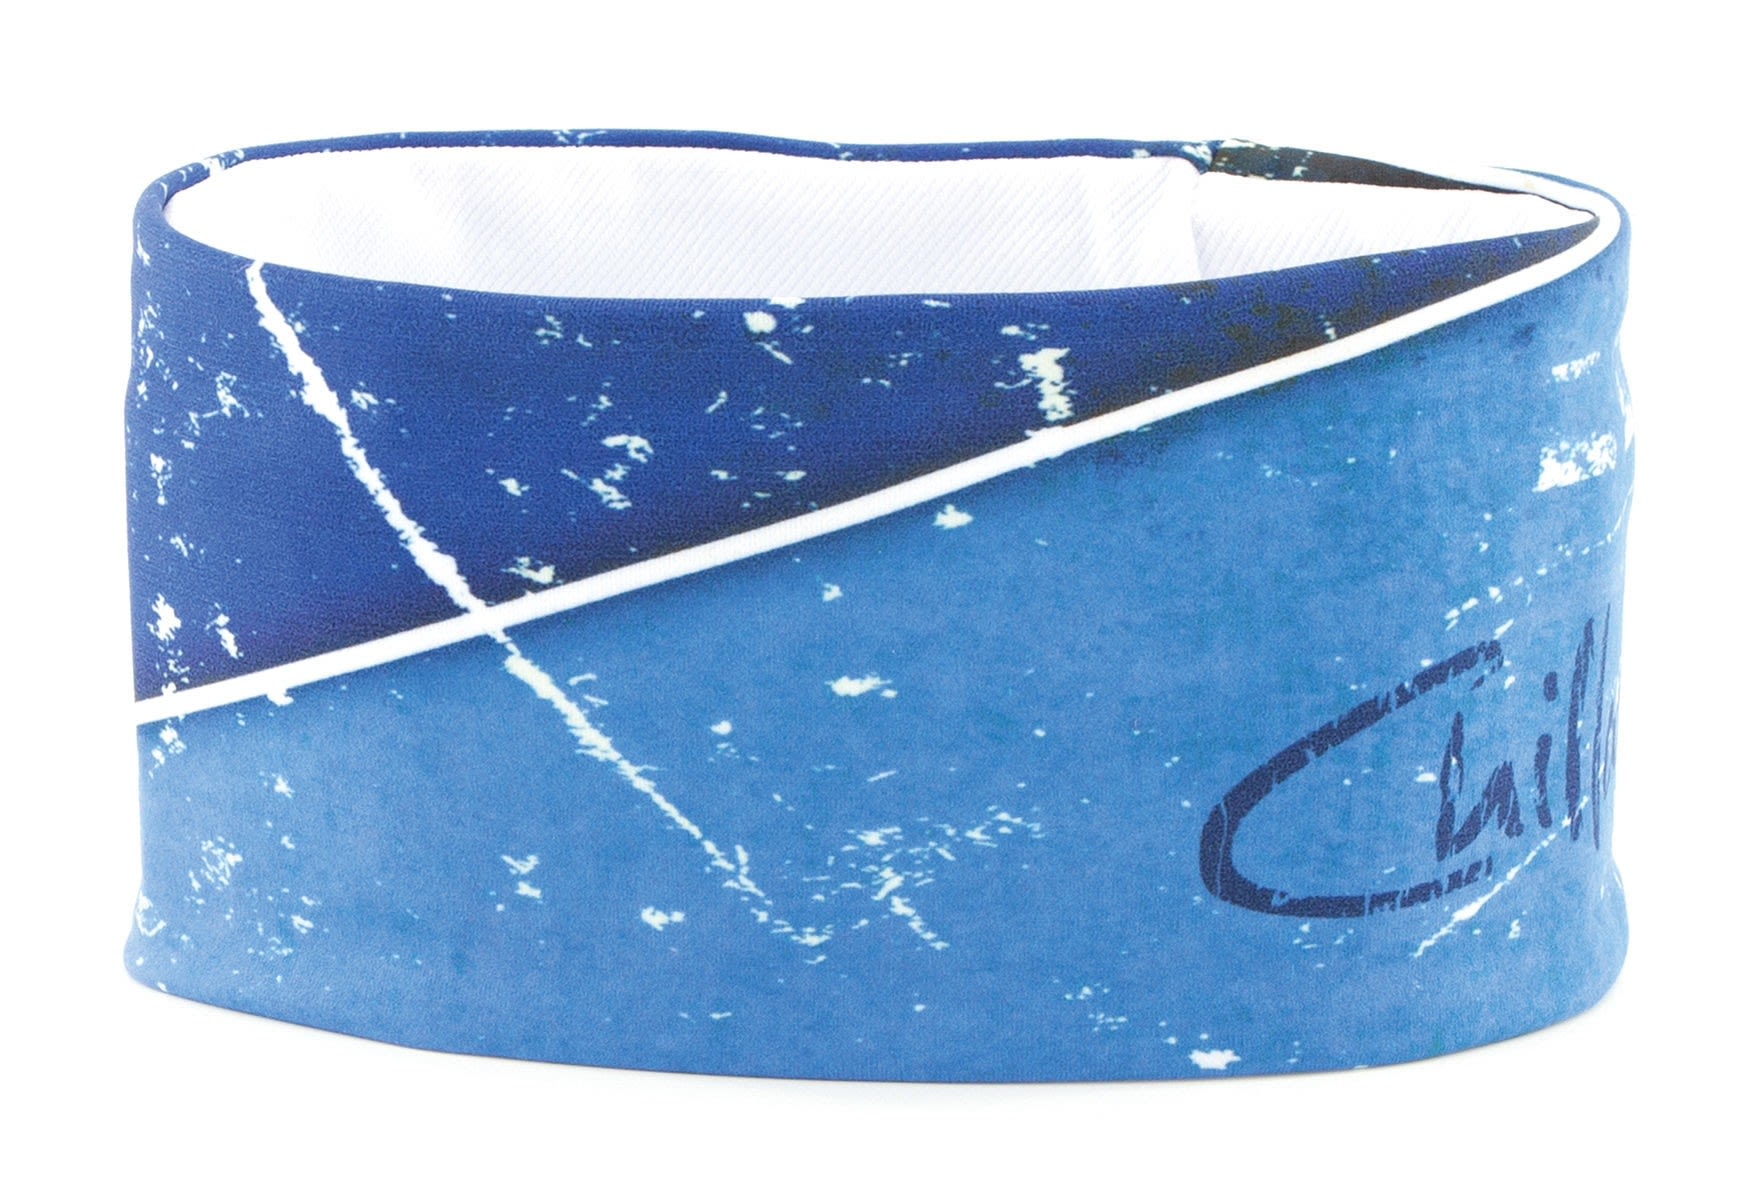 Chillaz Grunge Blau, Accessoires, One Size